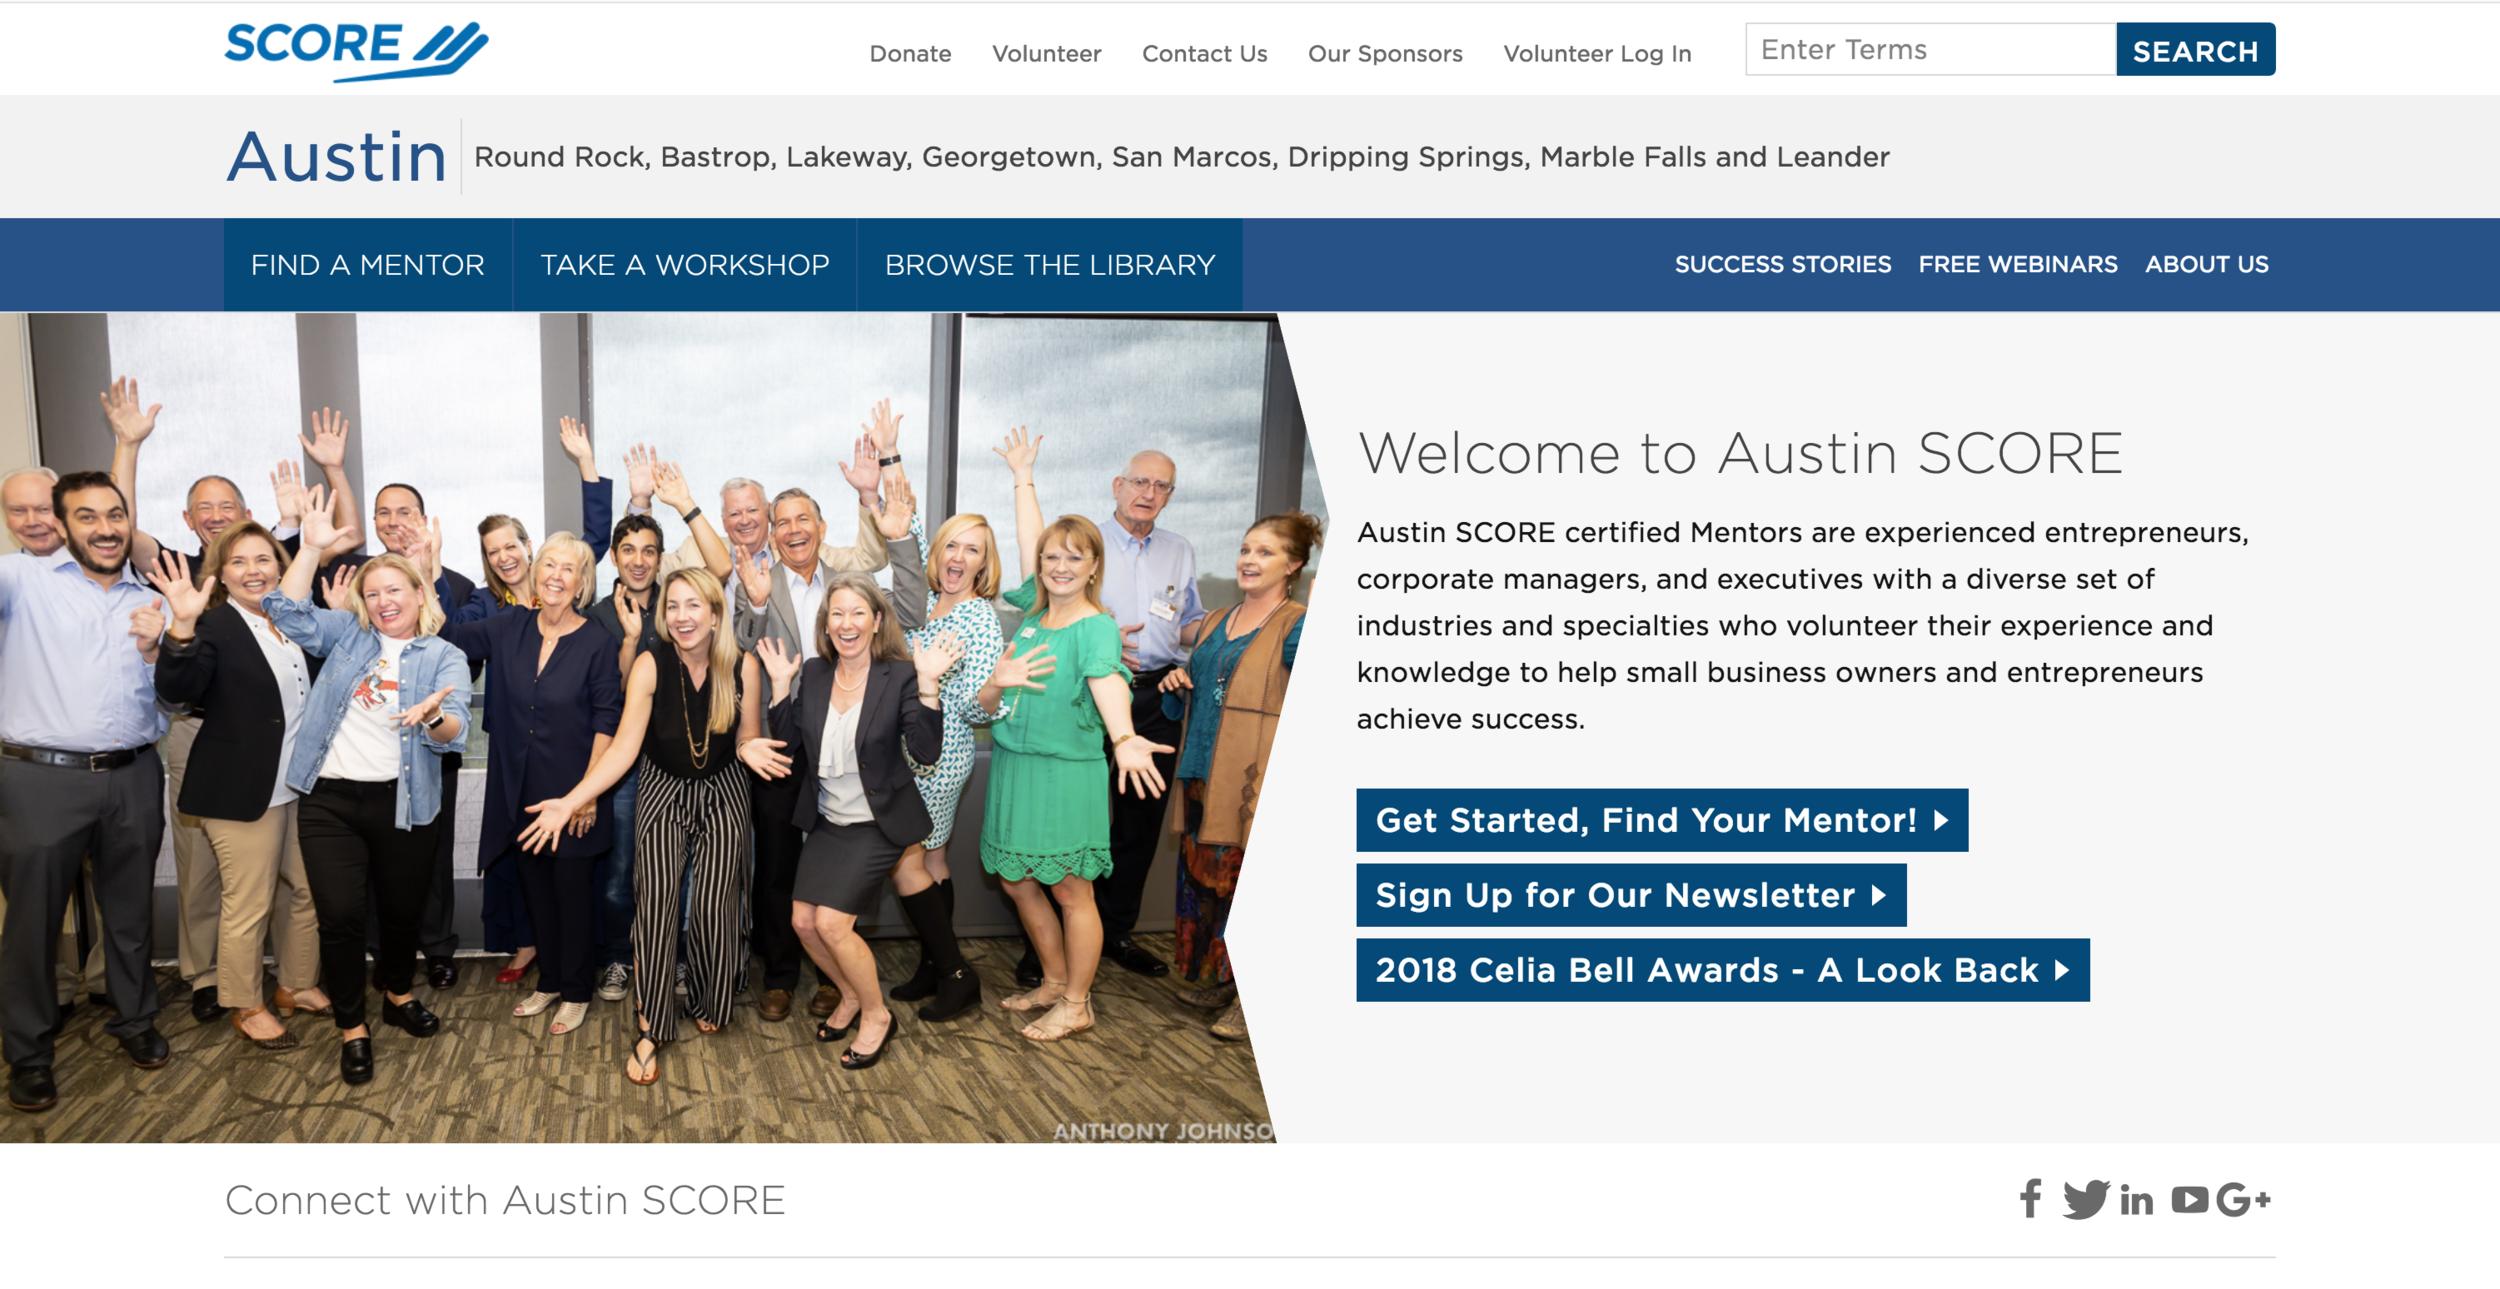 Score Austin Awards